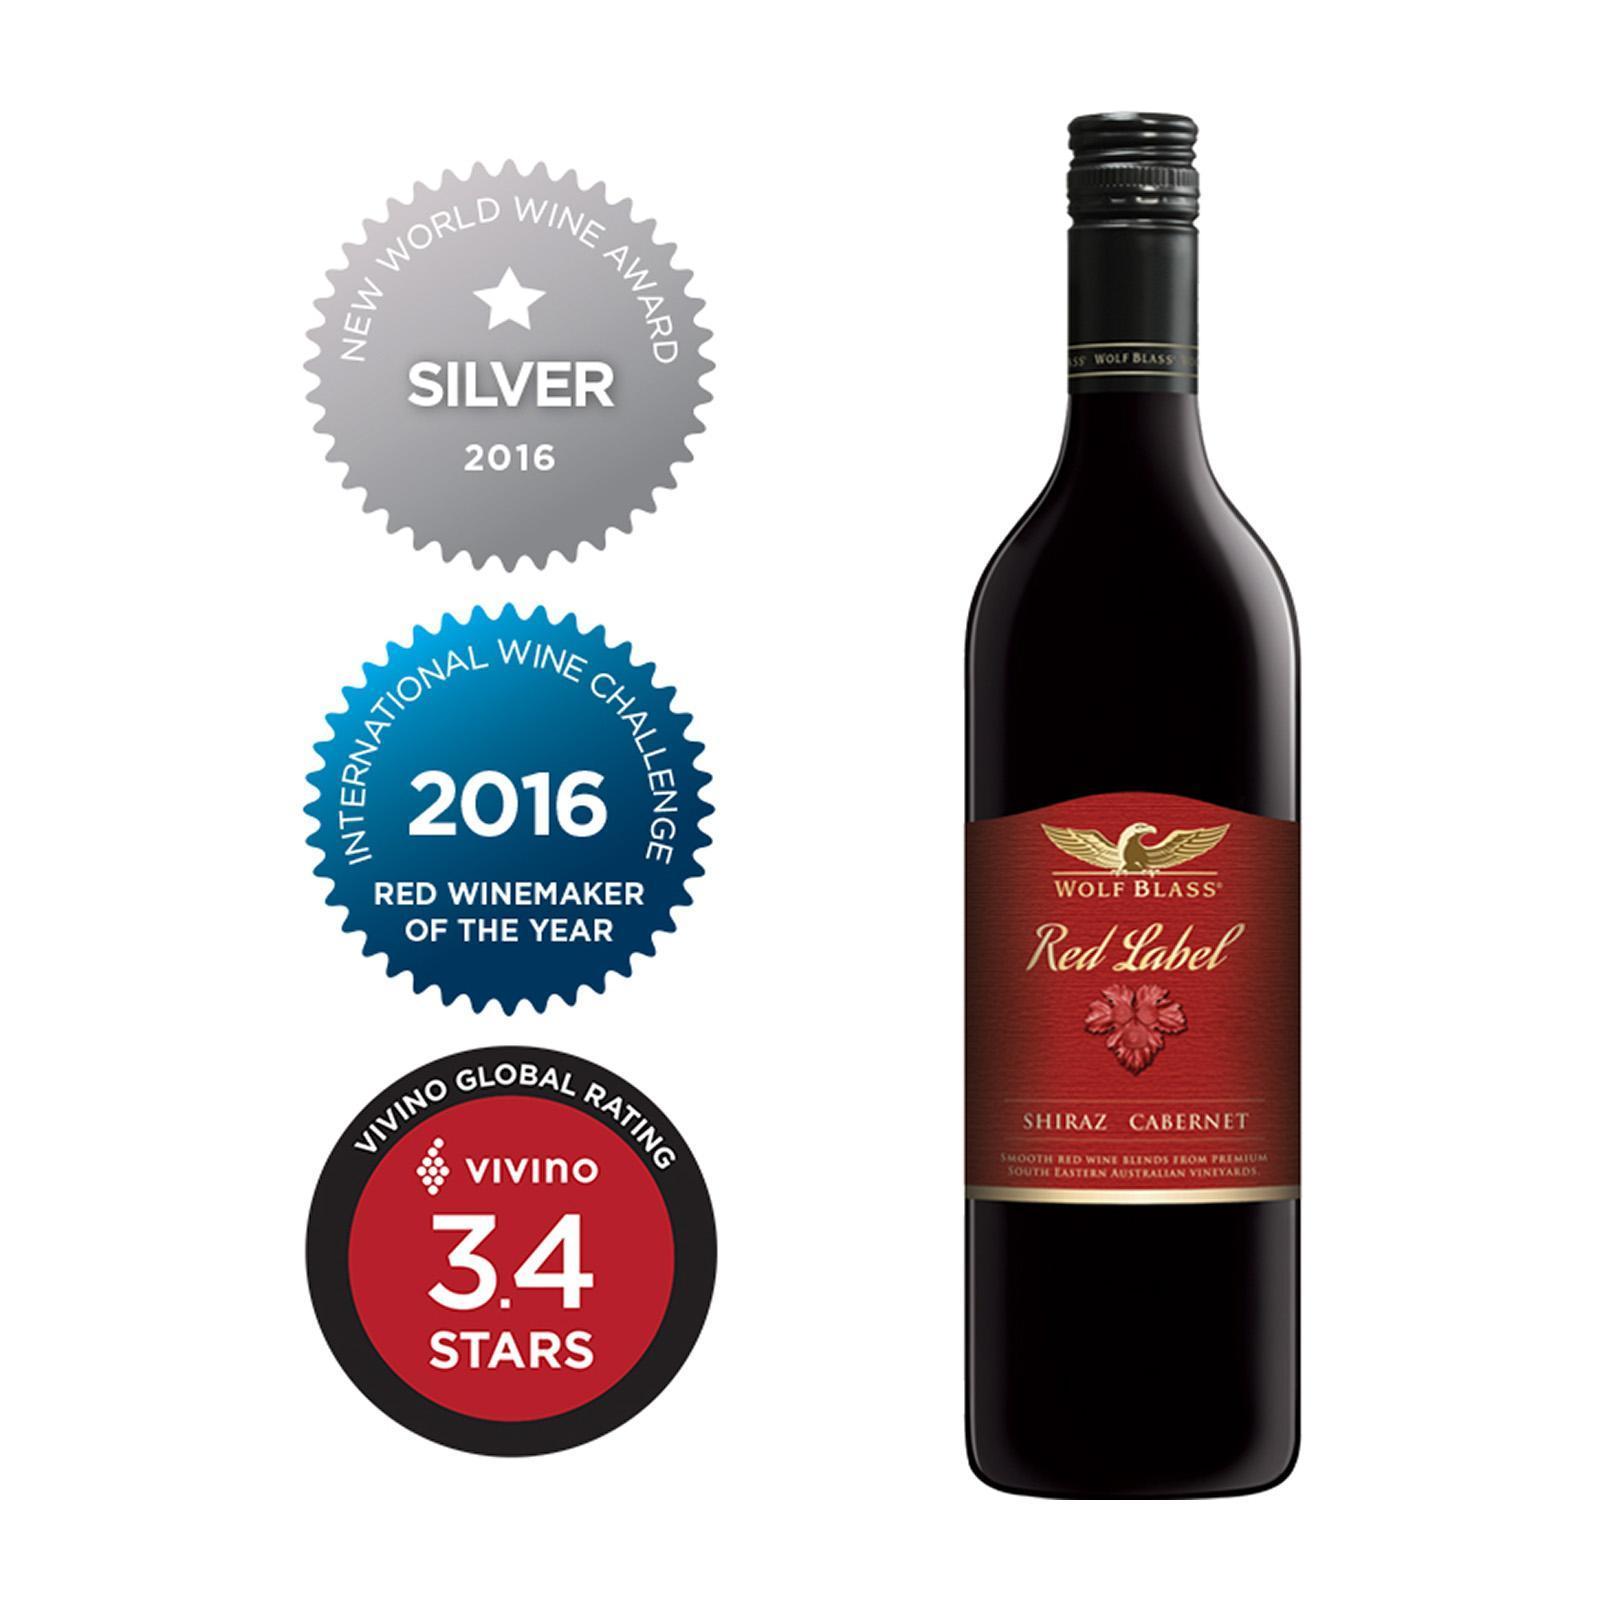 Wolf Blass Red Label Shiraz Cabernet Smooth Red Wine